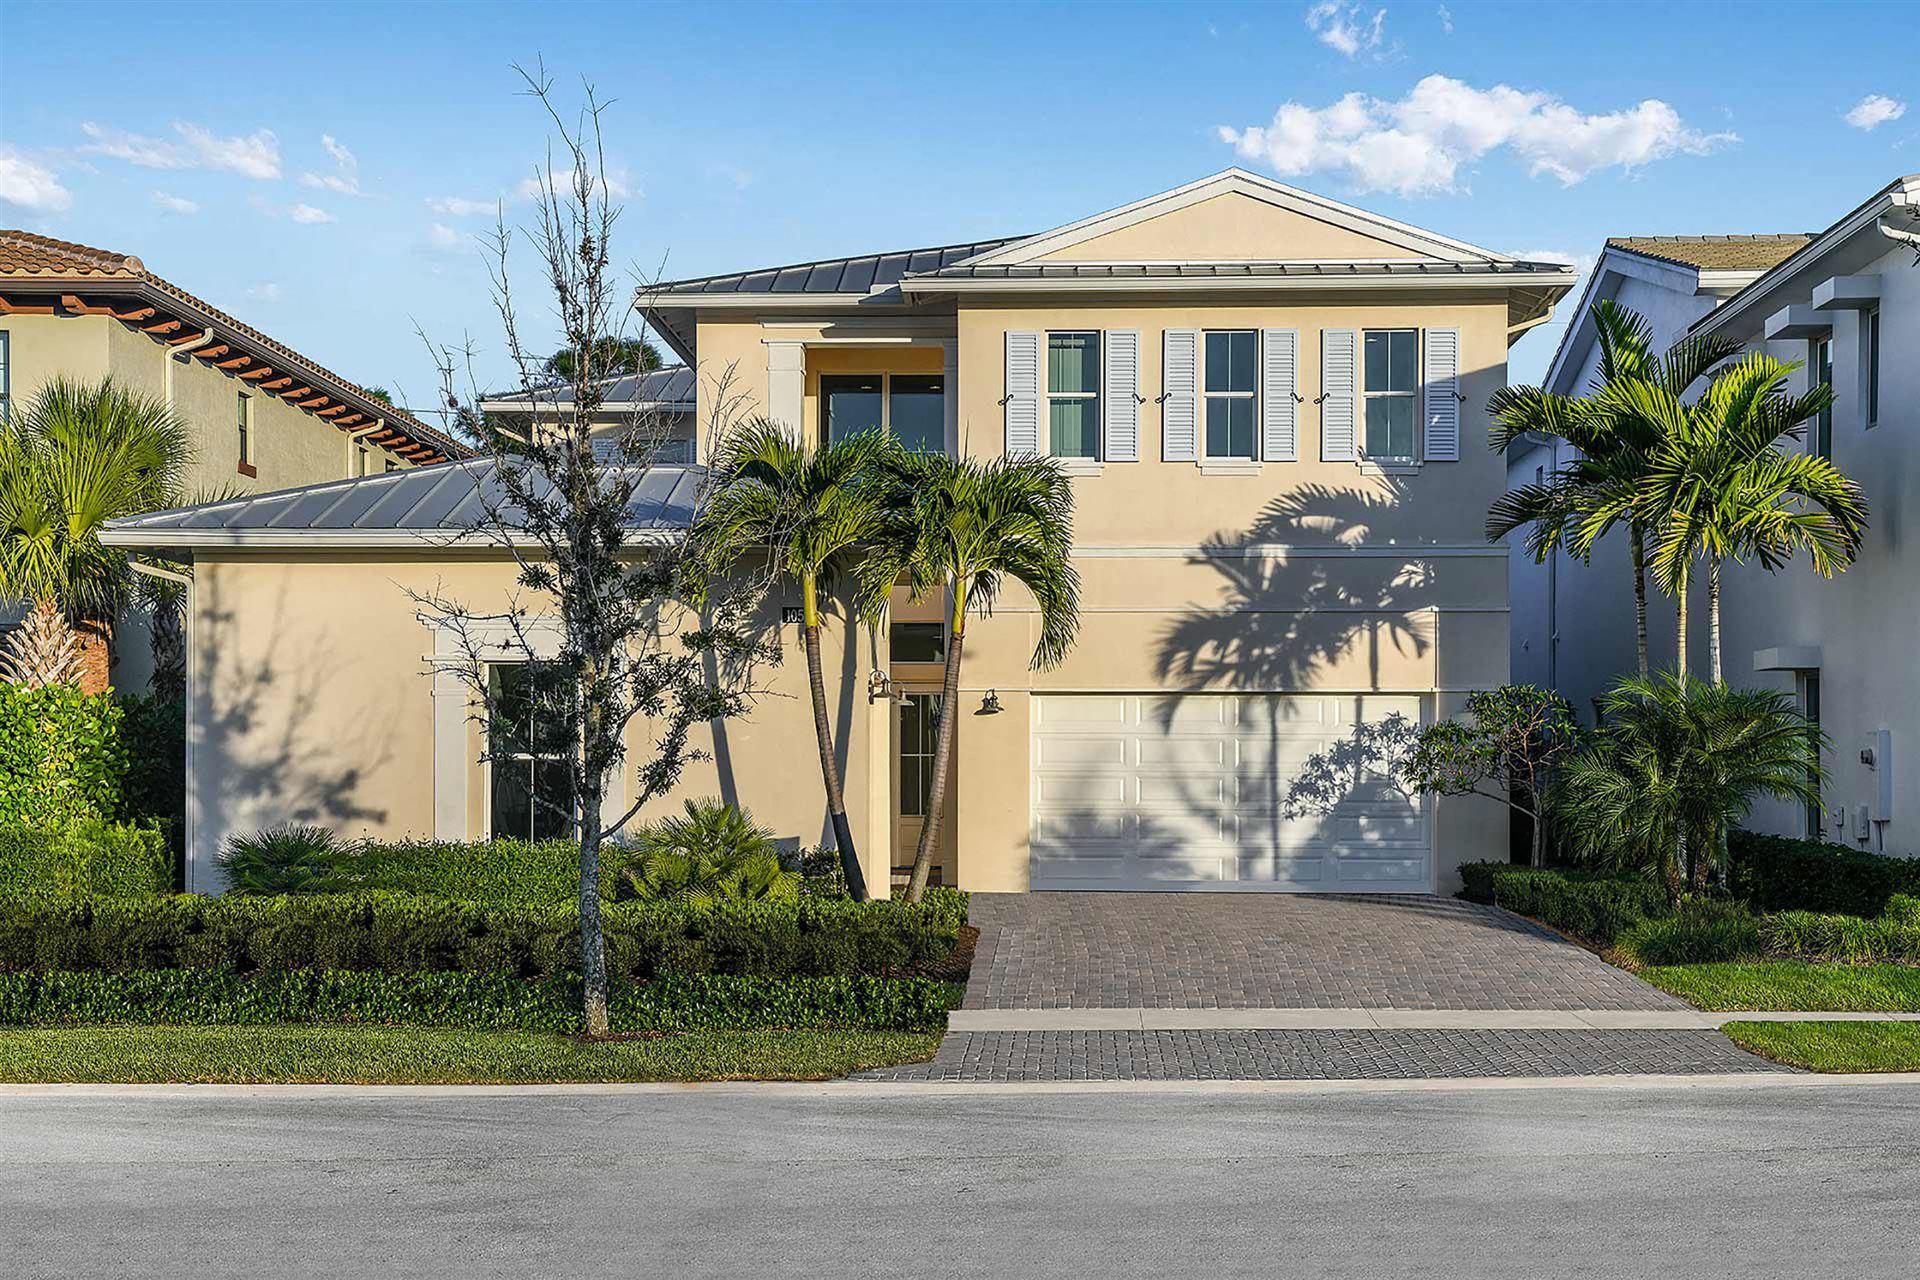 Photo of 1054 Faulkner Terrace, Palm Beach Gardens, FL 33418 (MLS # RX-10708416)